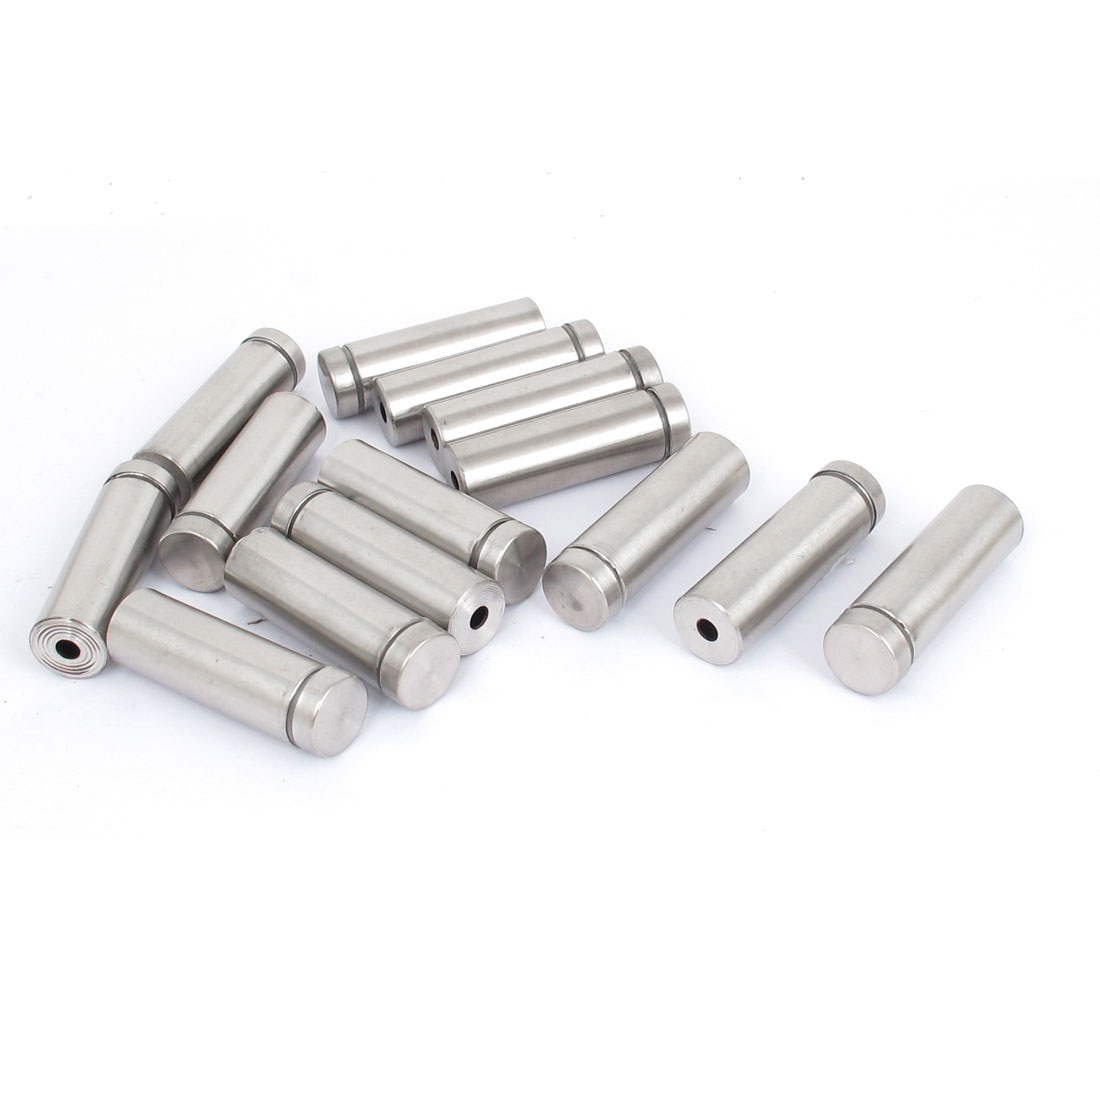 16mm x 50mm Stainless Steel Advertising Frameless Glass Standoff Pins 14pcs